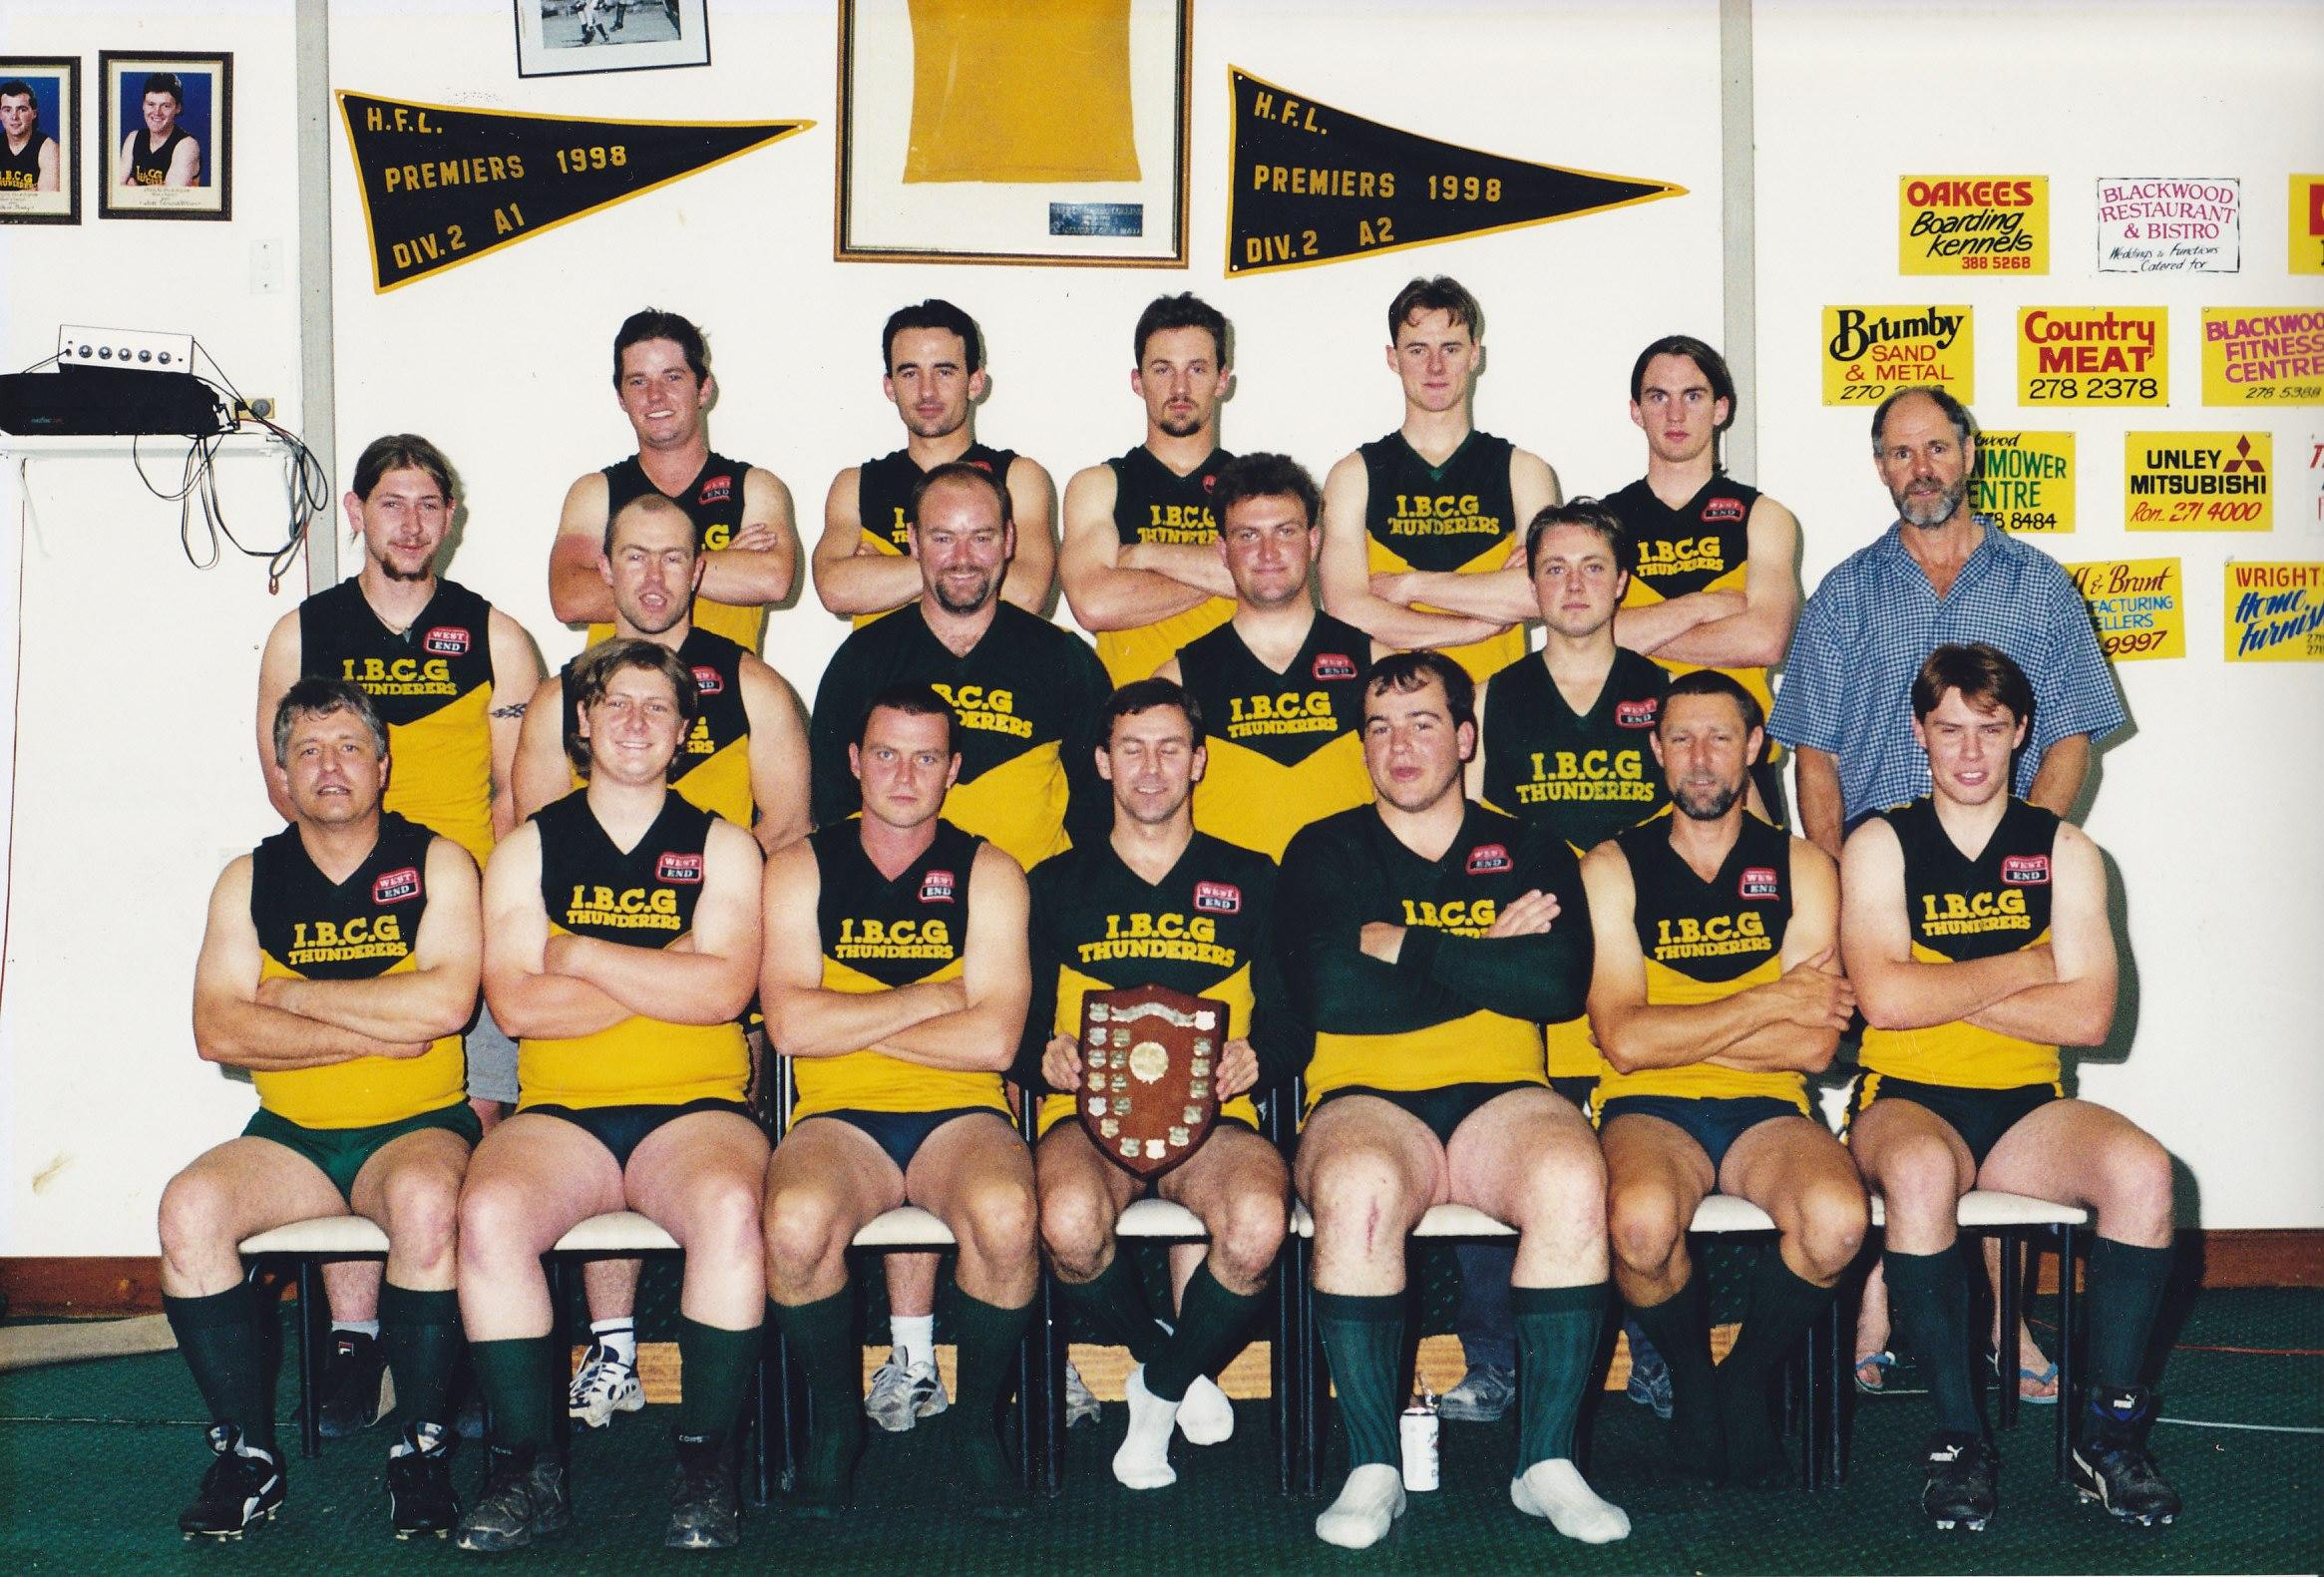 1998 B Grade Premiership.jpg